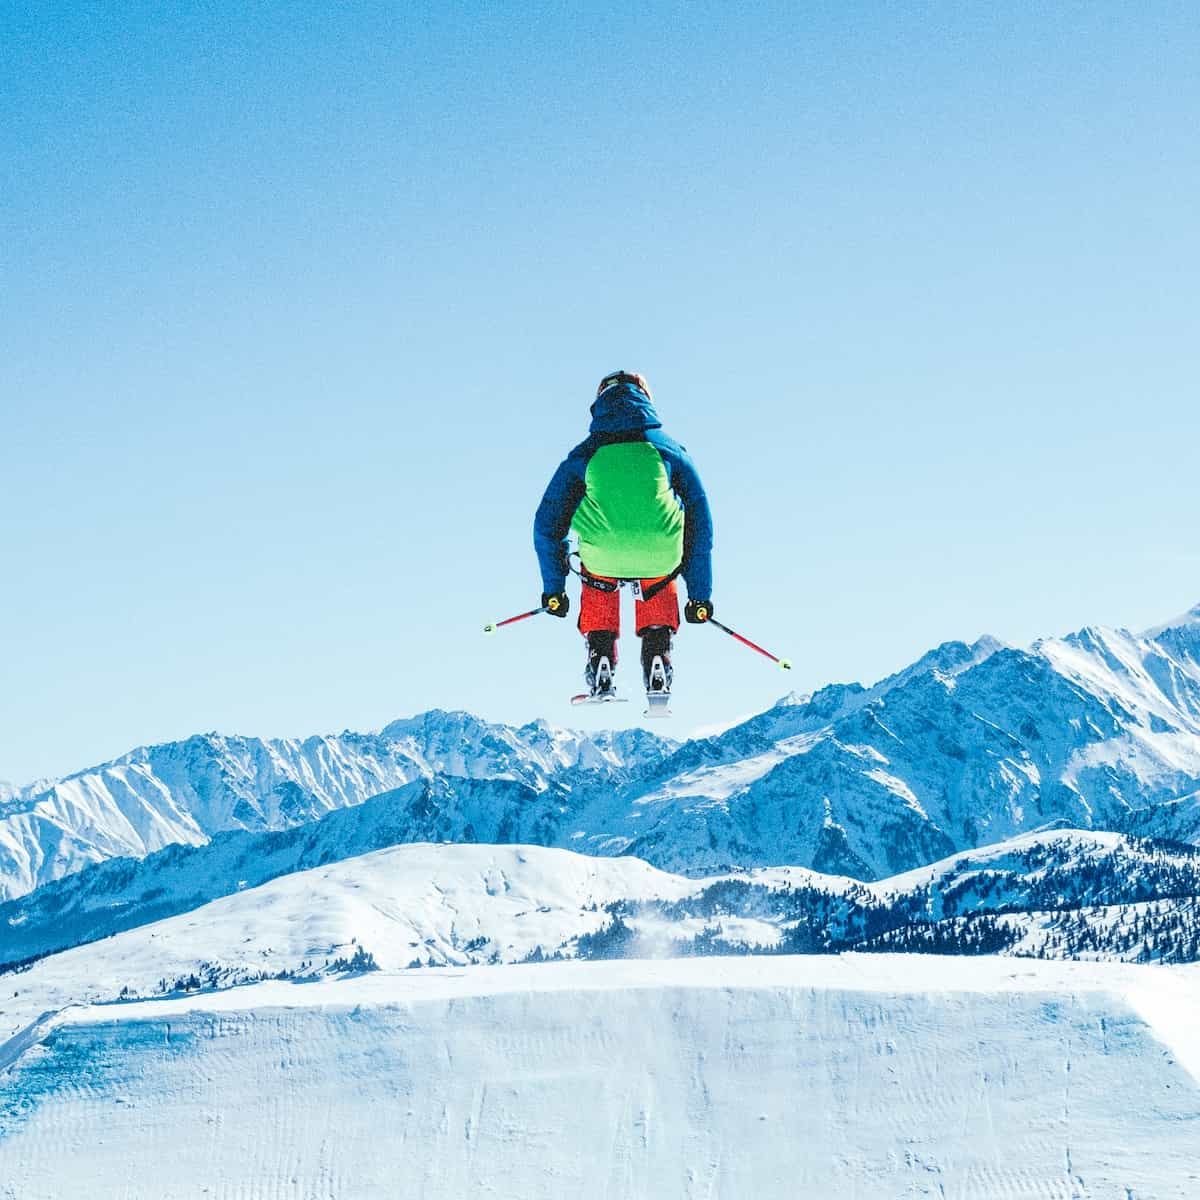 Ski-Urlaub im Frühjahr